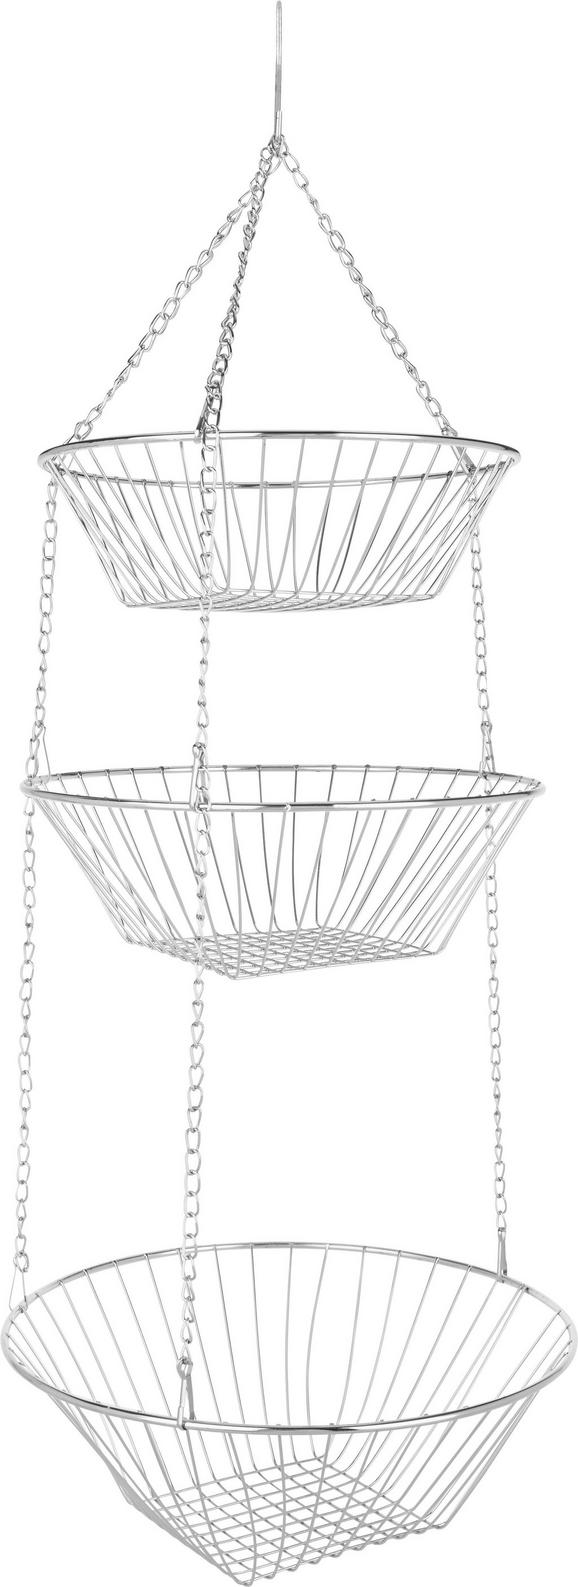 Košarica Za Sadje Rosalie - srebrna, kovina (28,2/28/9,9cm)